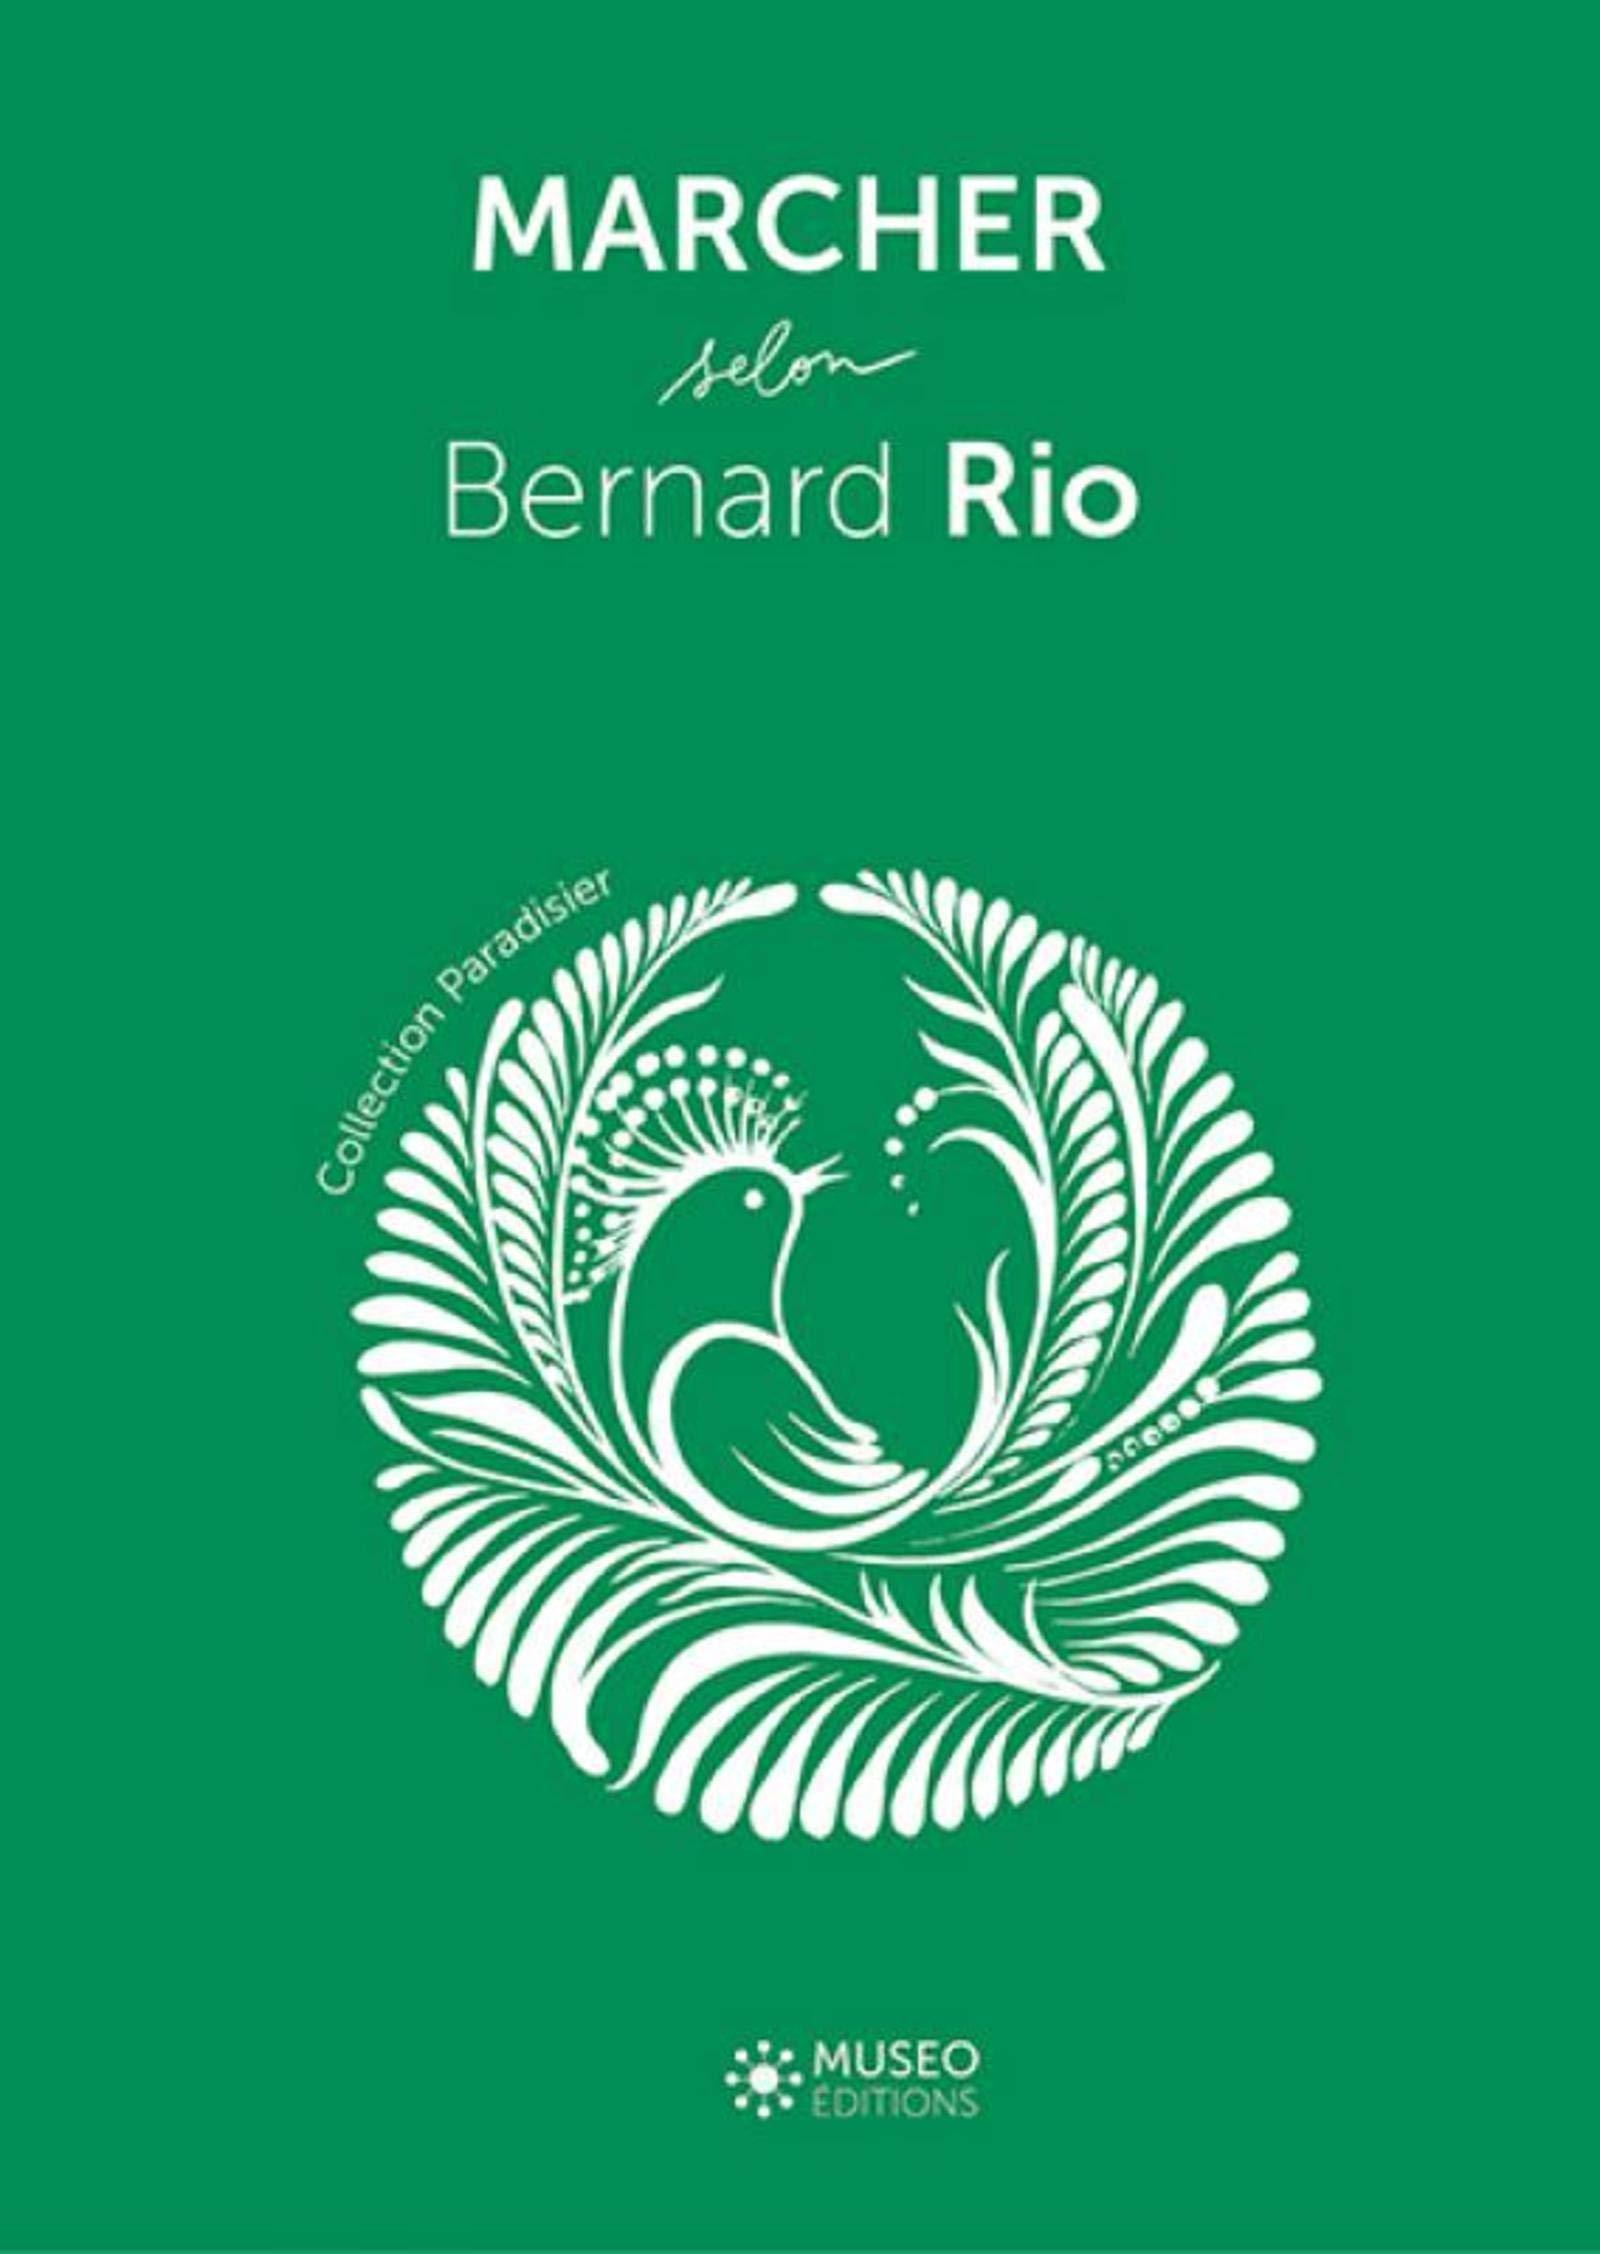 bernard rio - marcher